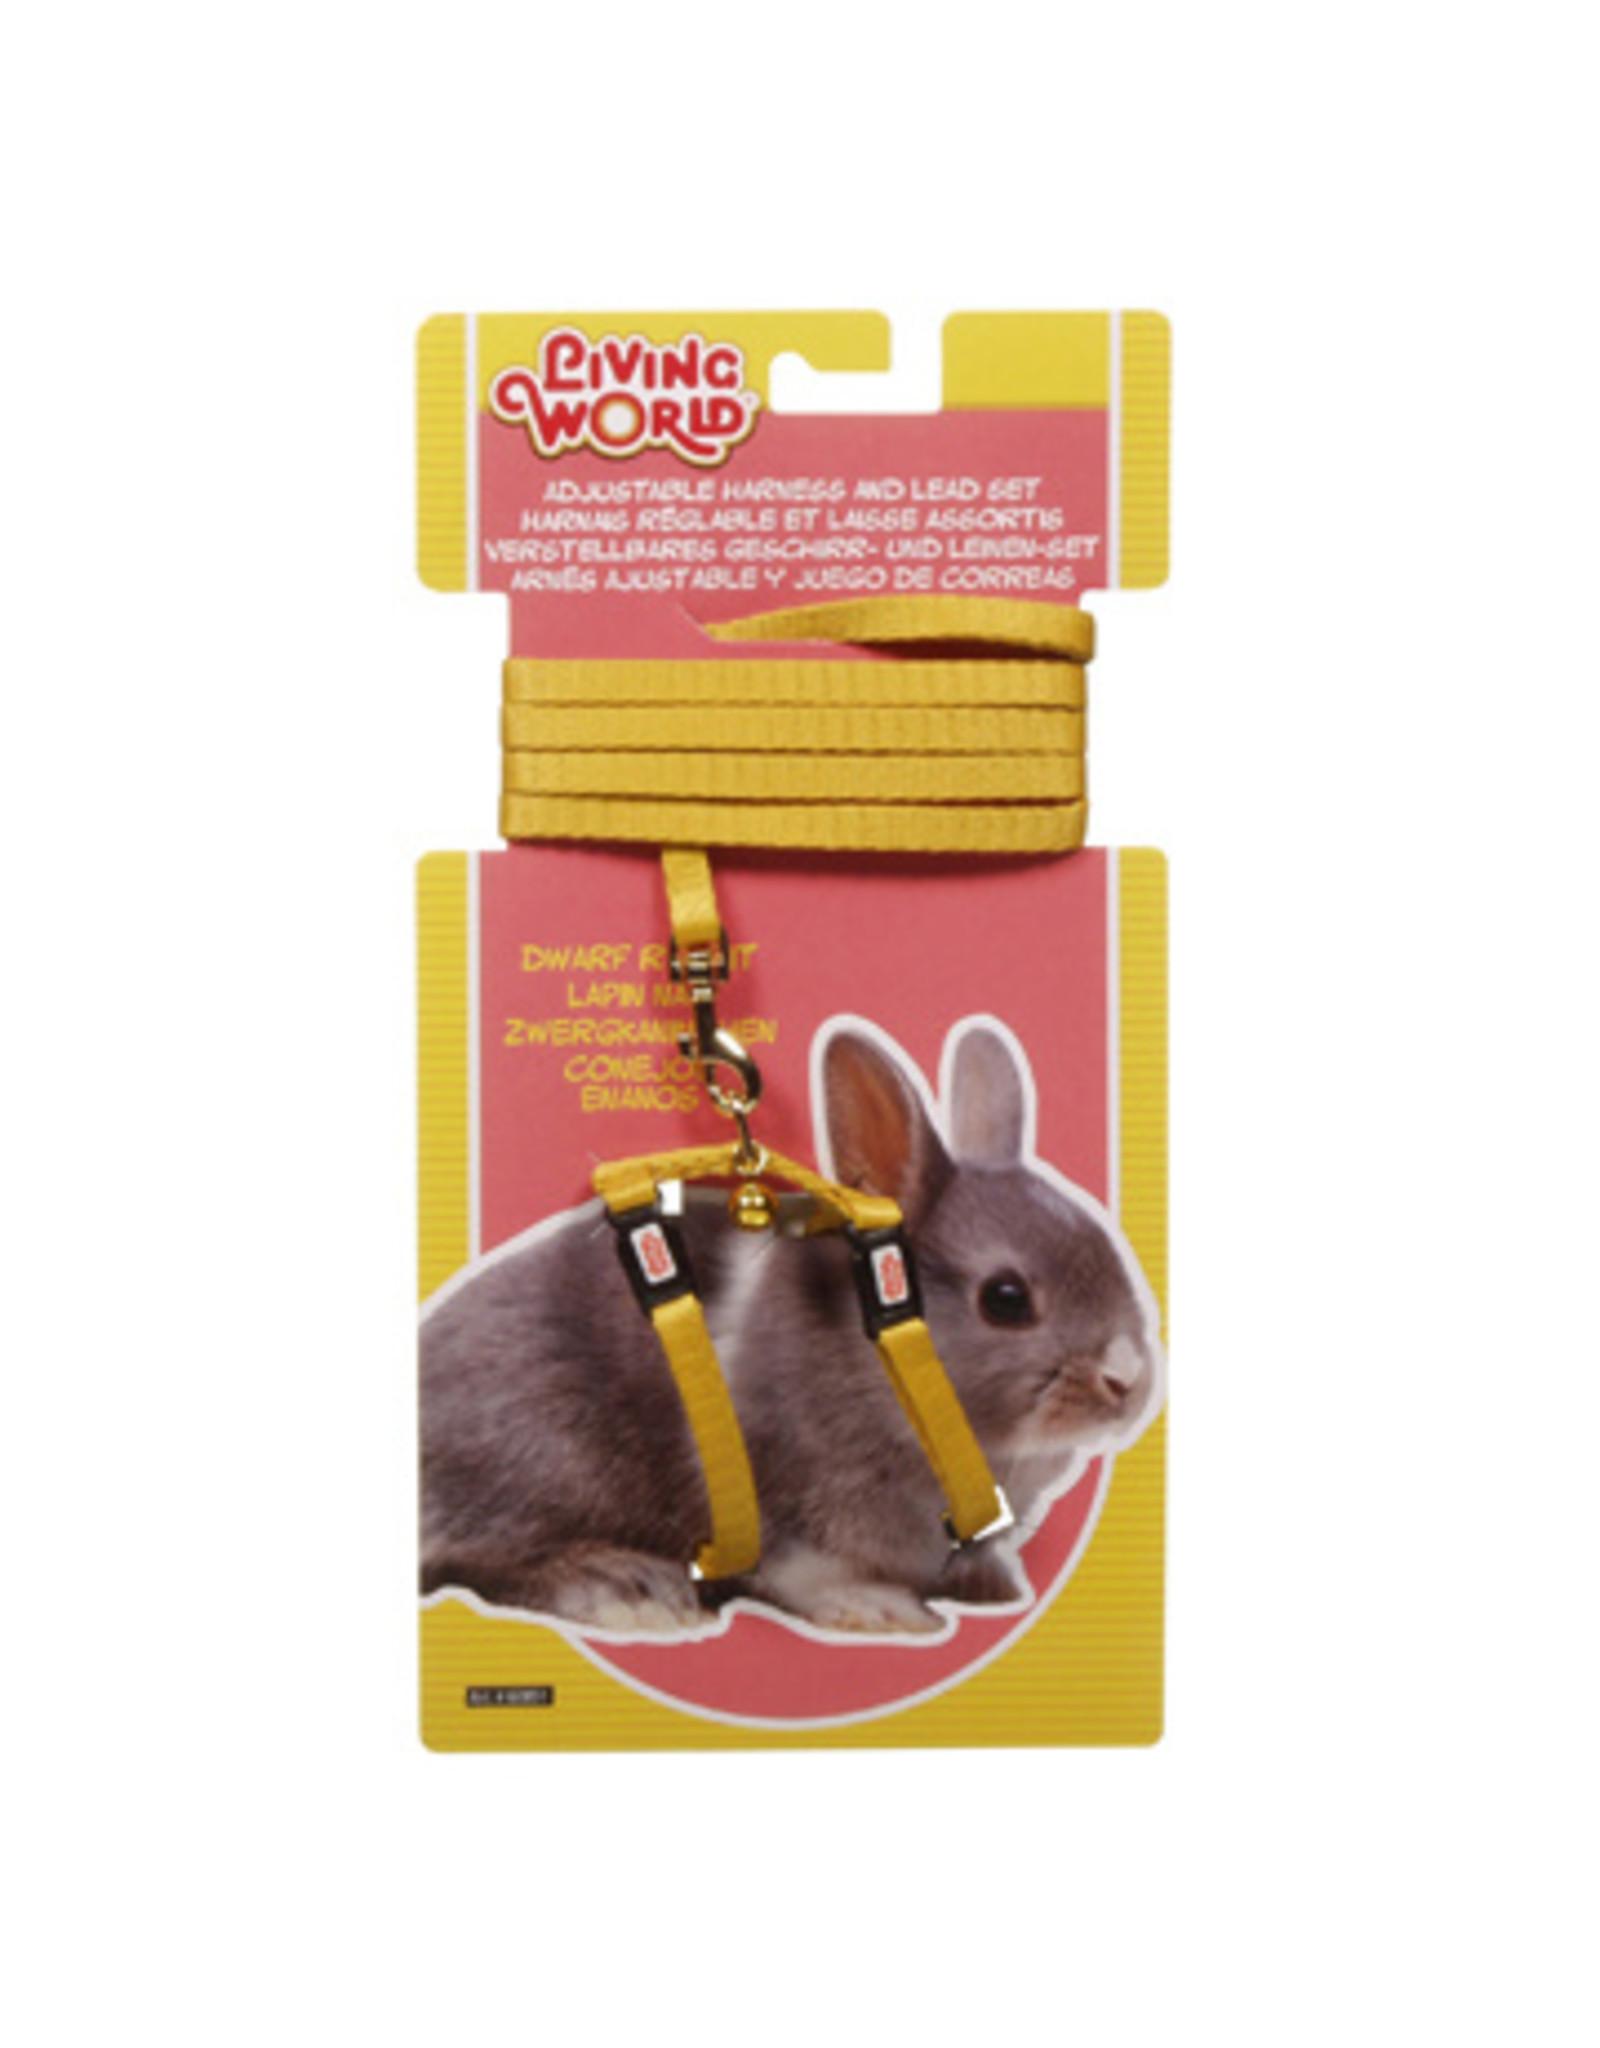 Living World LIVING WORLD Harness & Lead Set Dwarf Rabbit